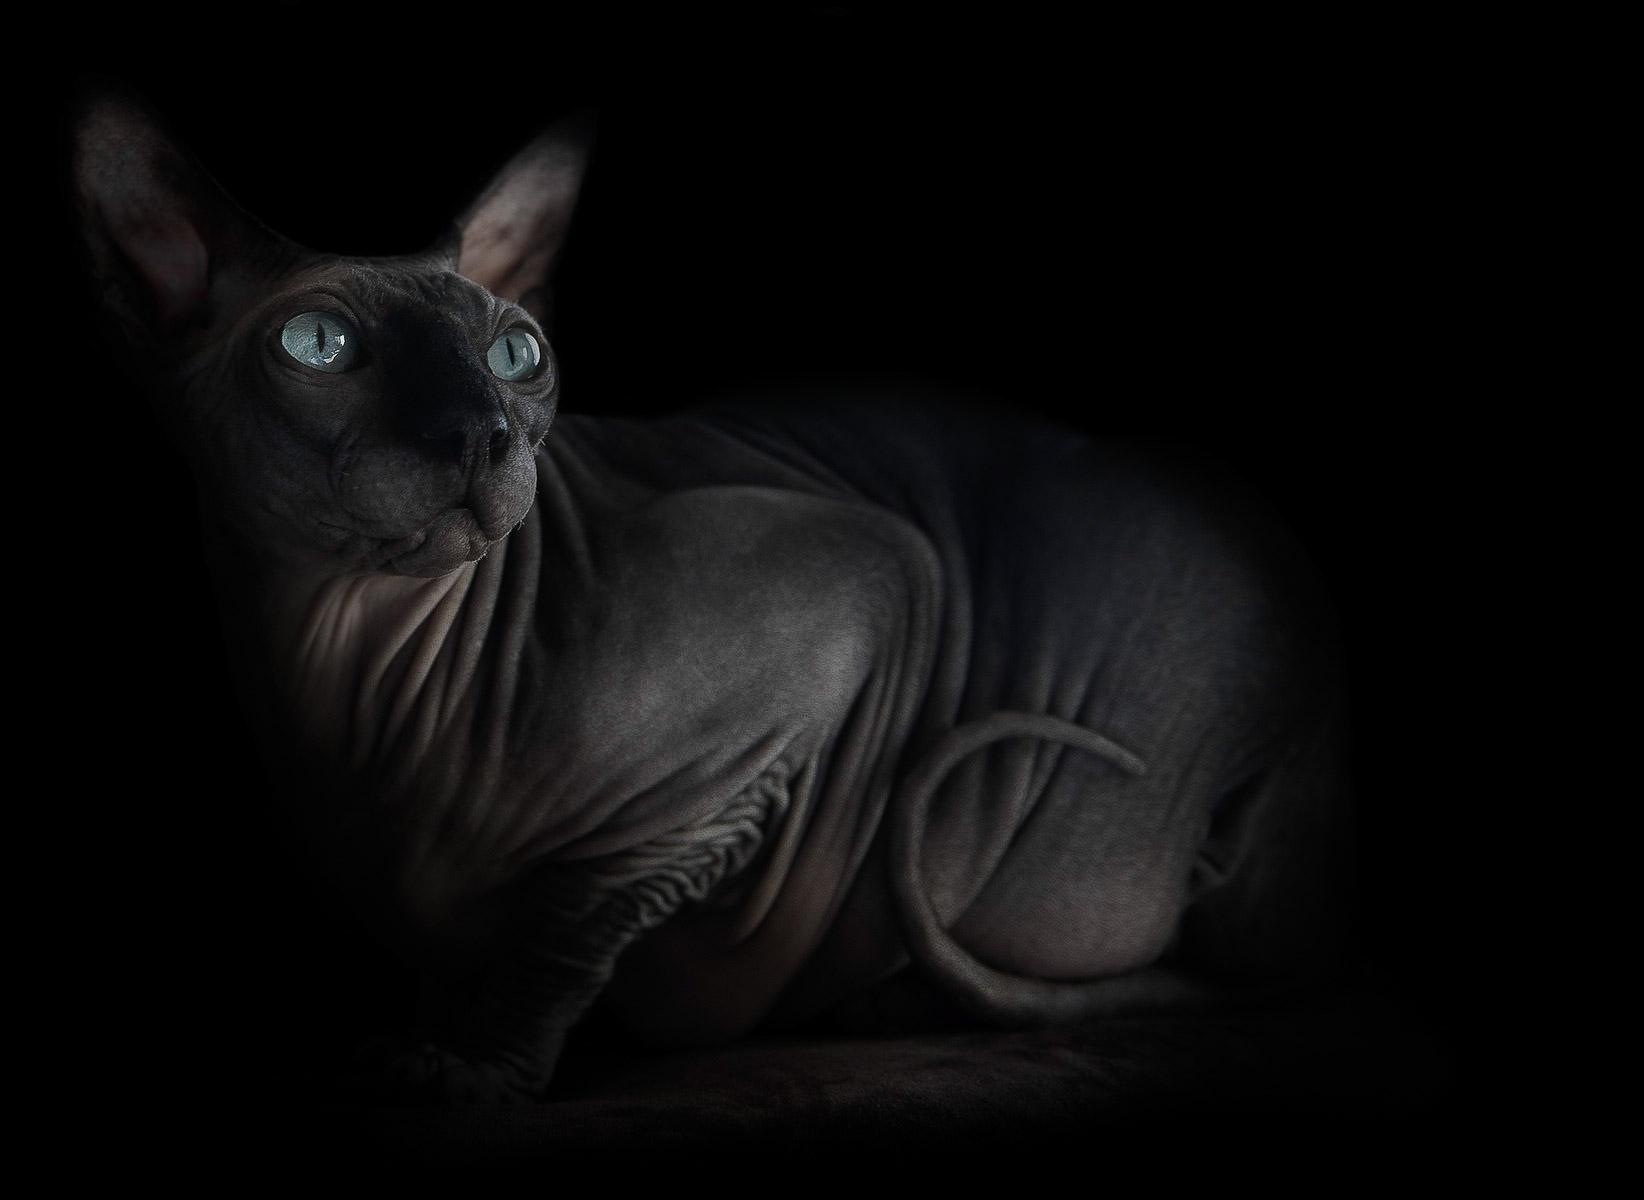 sphynx-cat-photos-by-alicia-rius-7.jpg